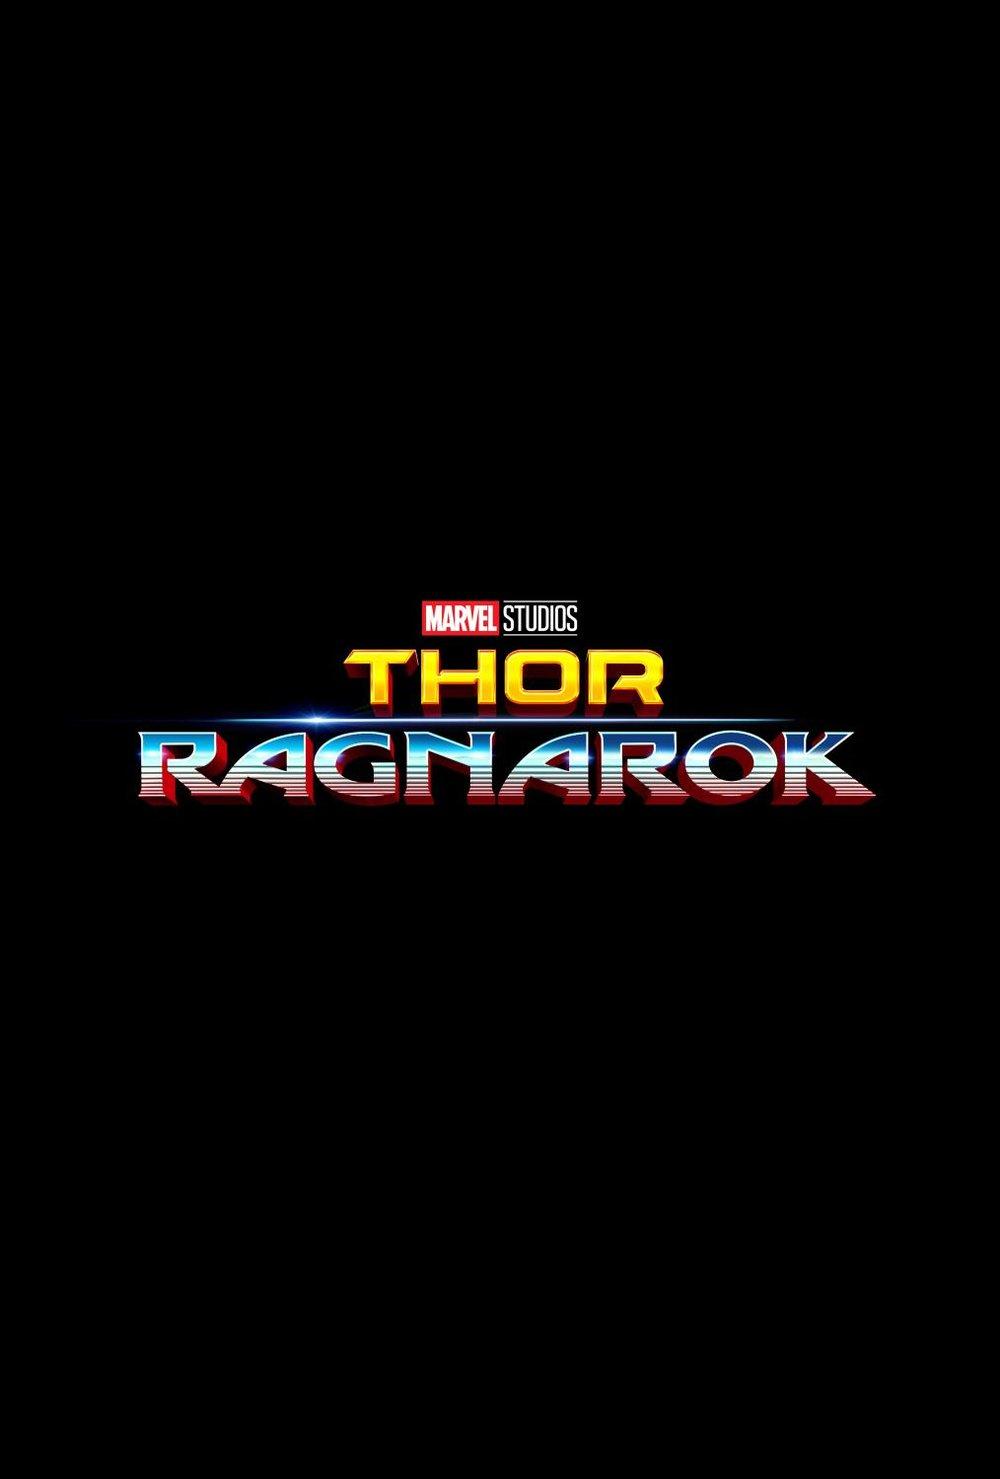 November 3, 2017 THOR: RAGNAROK (Marvel Studios) #ThorRagnarok